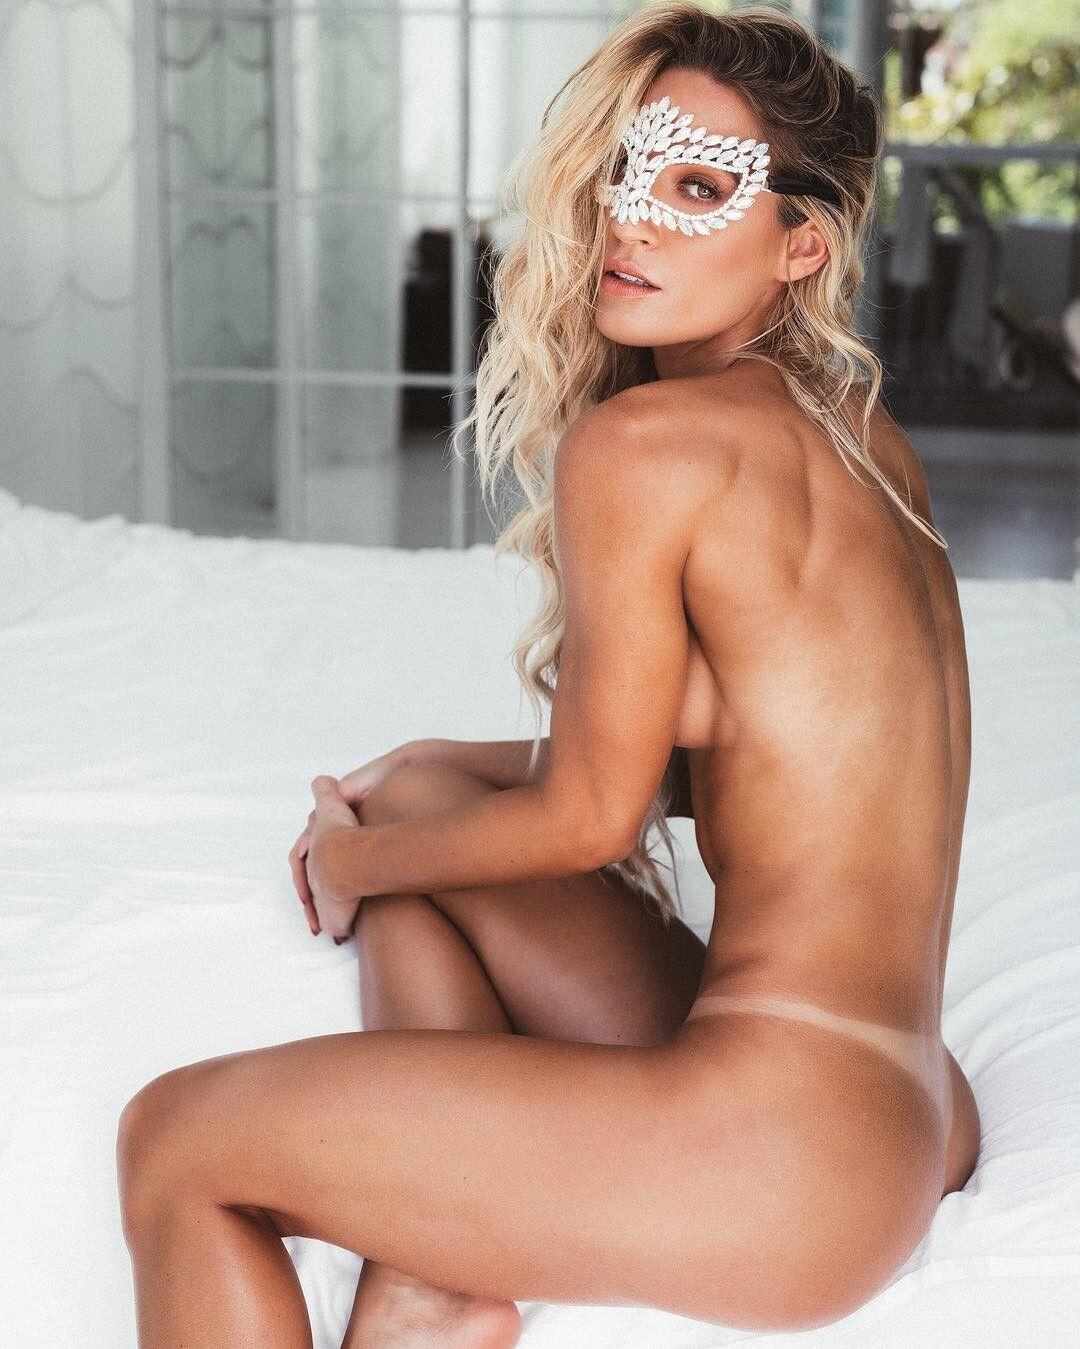 Валентина Лекё